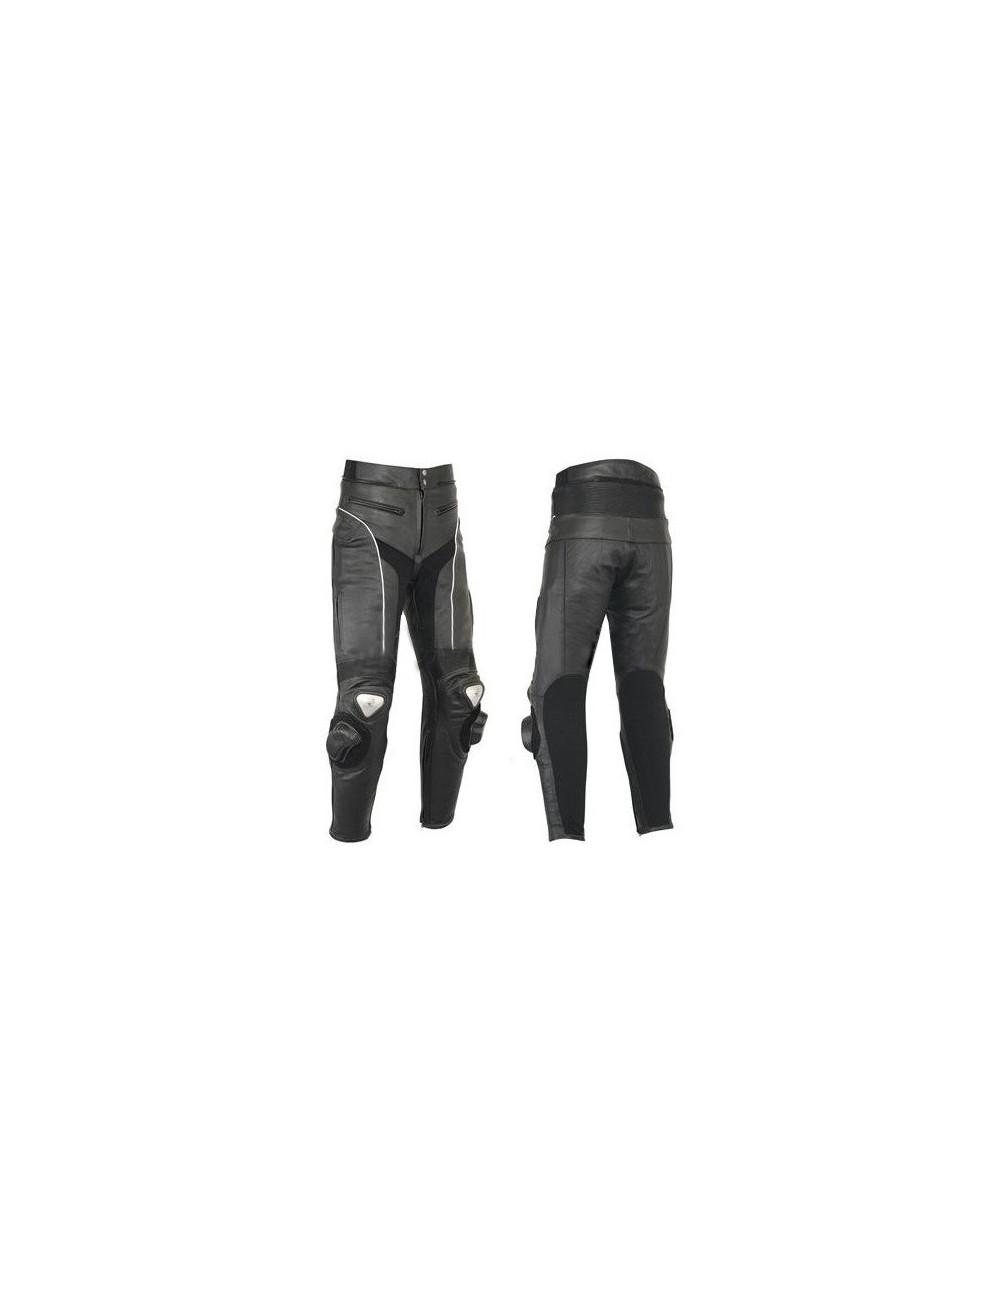 Pantalon moto cuir - Pantalon moto cuir noir haute protection